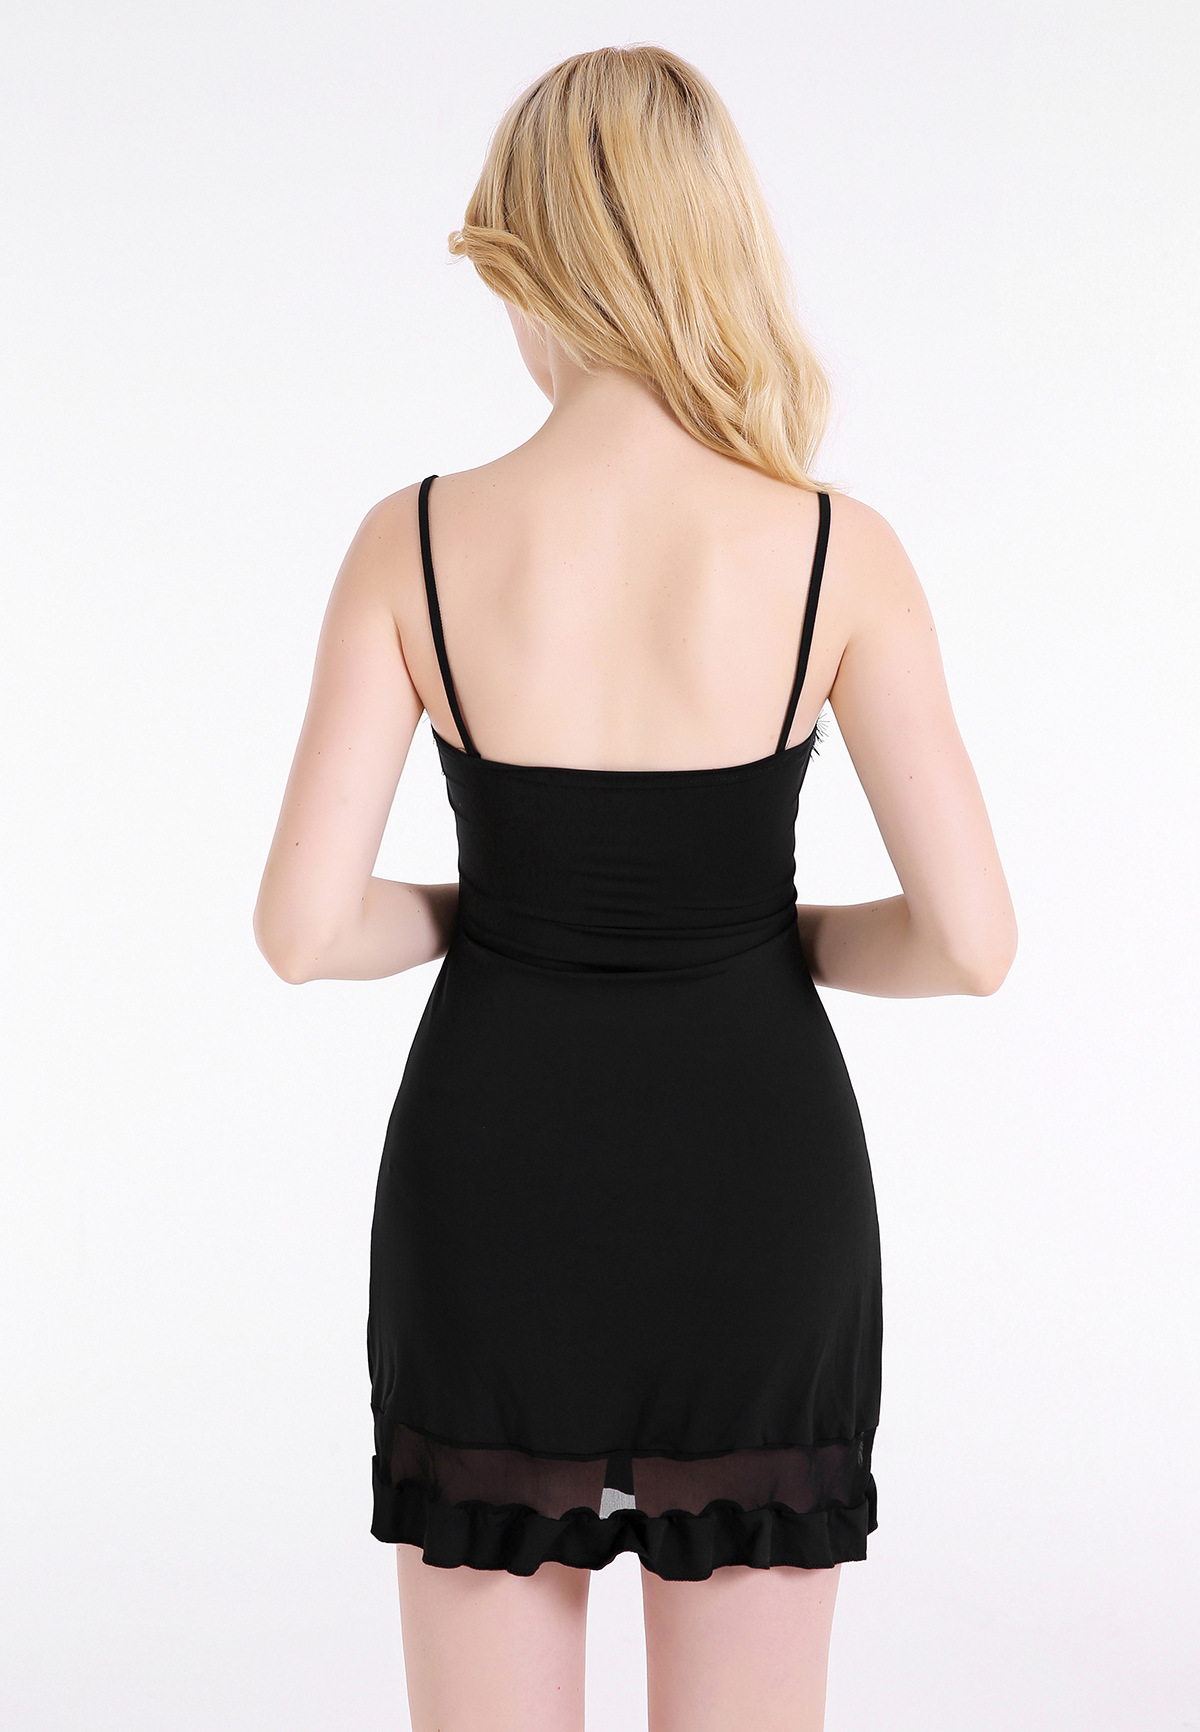 ff4ca0e5753 Europe and America sexy black lace strap dress mesh stitching nightclub  dress